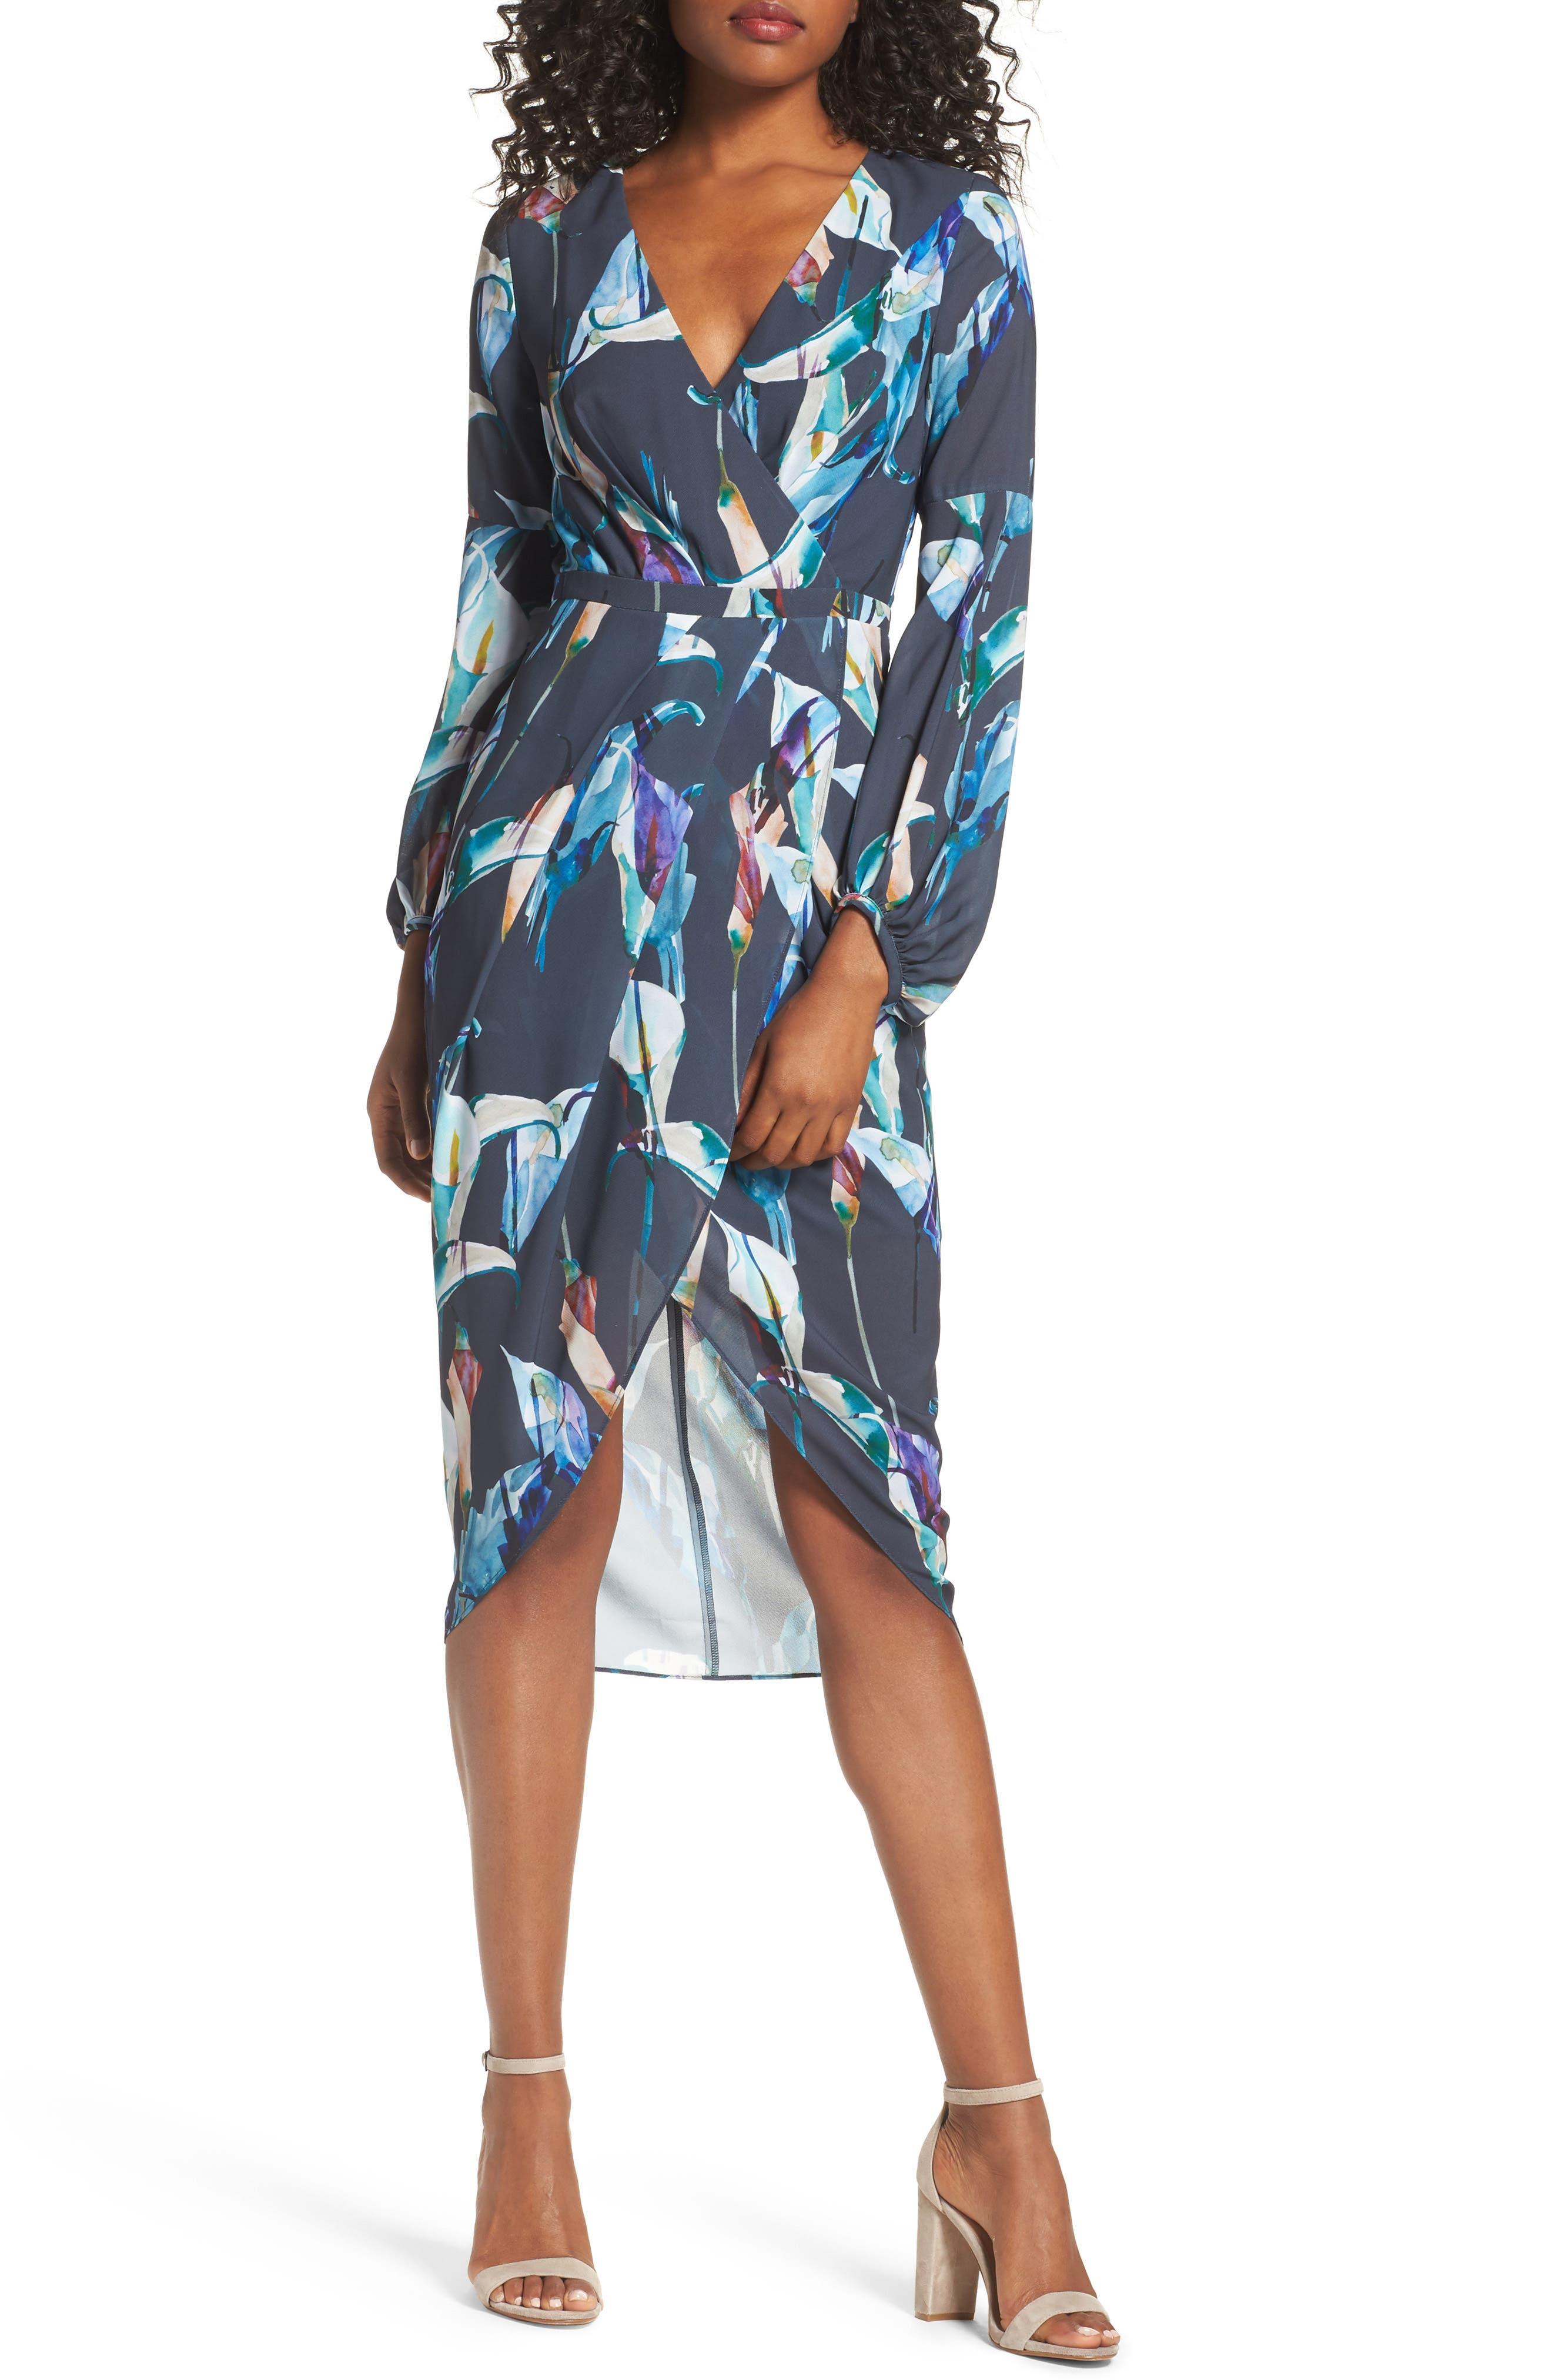 Cooper St Romanticise Midi Dress